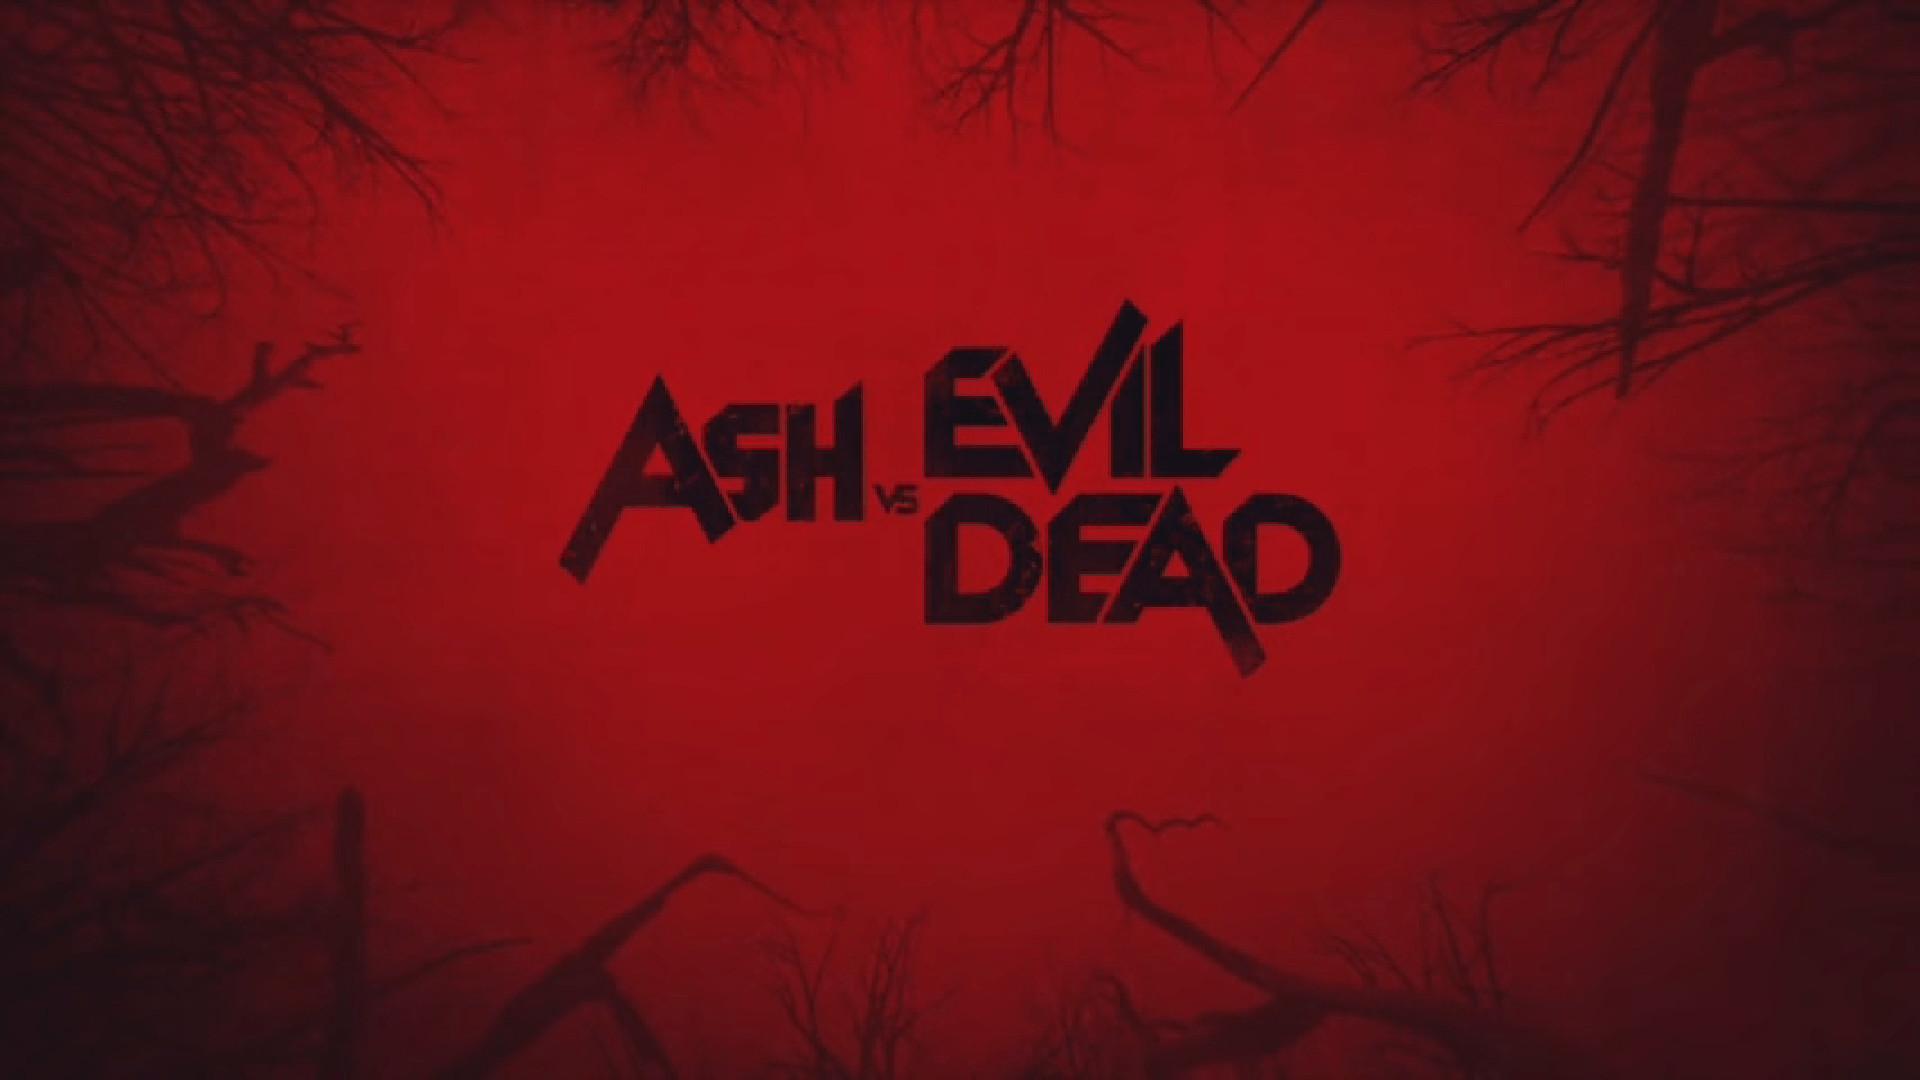 Ash Vs Evil Dead Wallpaper 57 Images